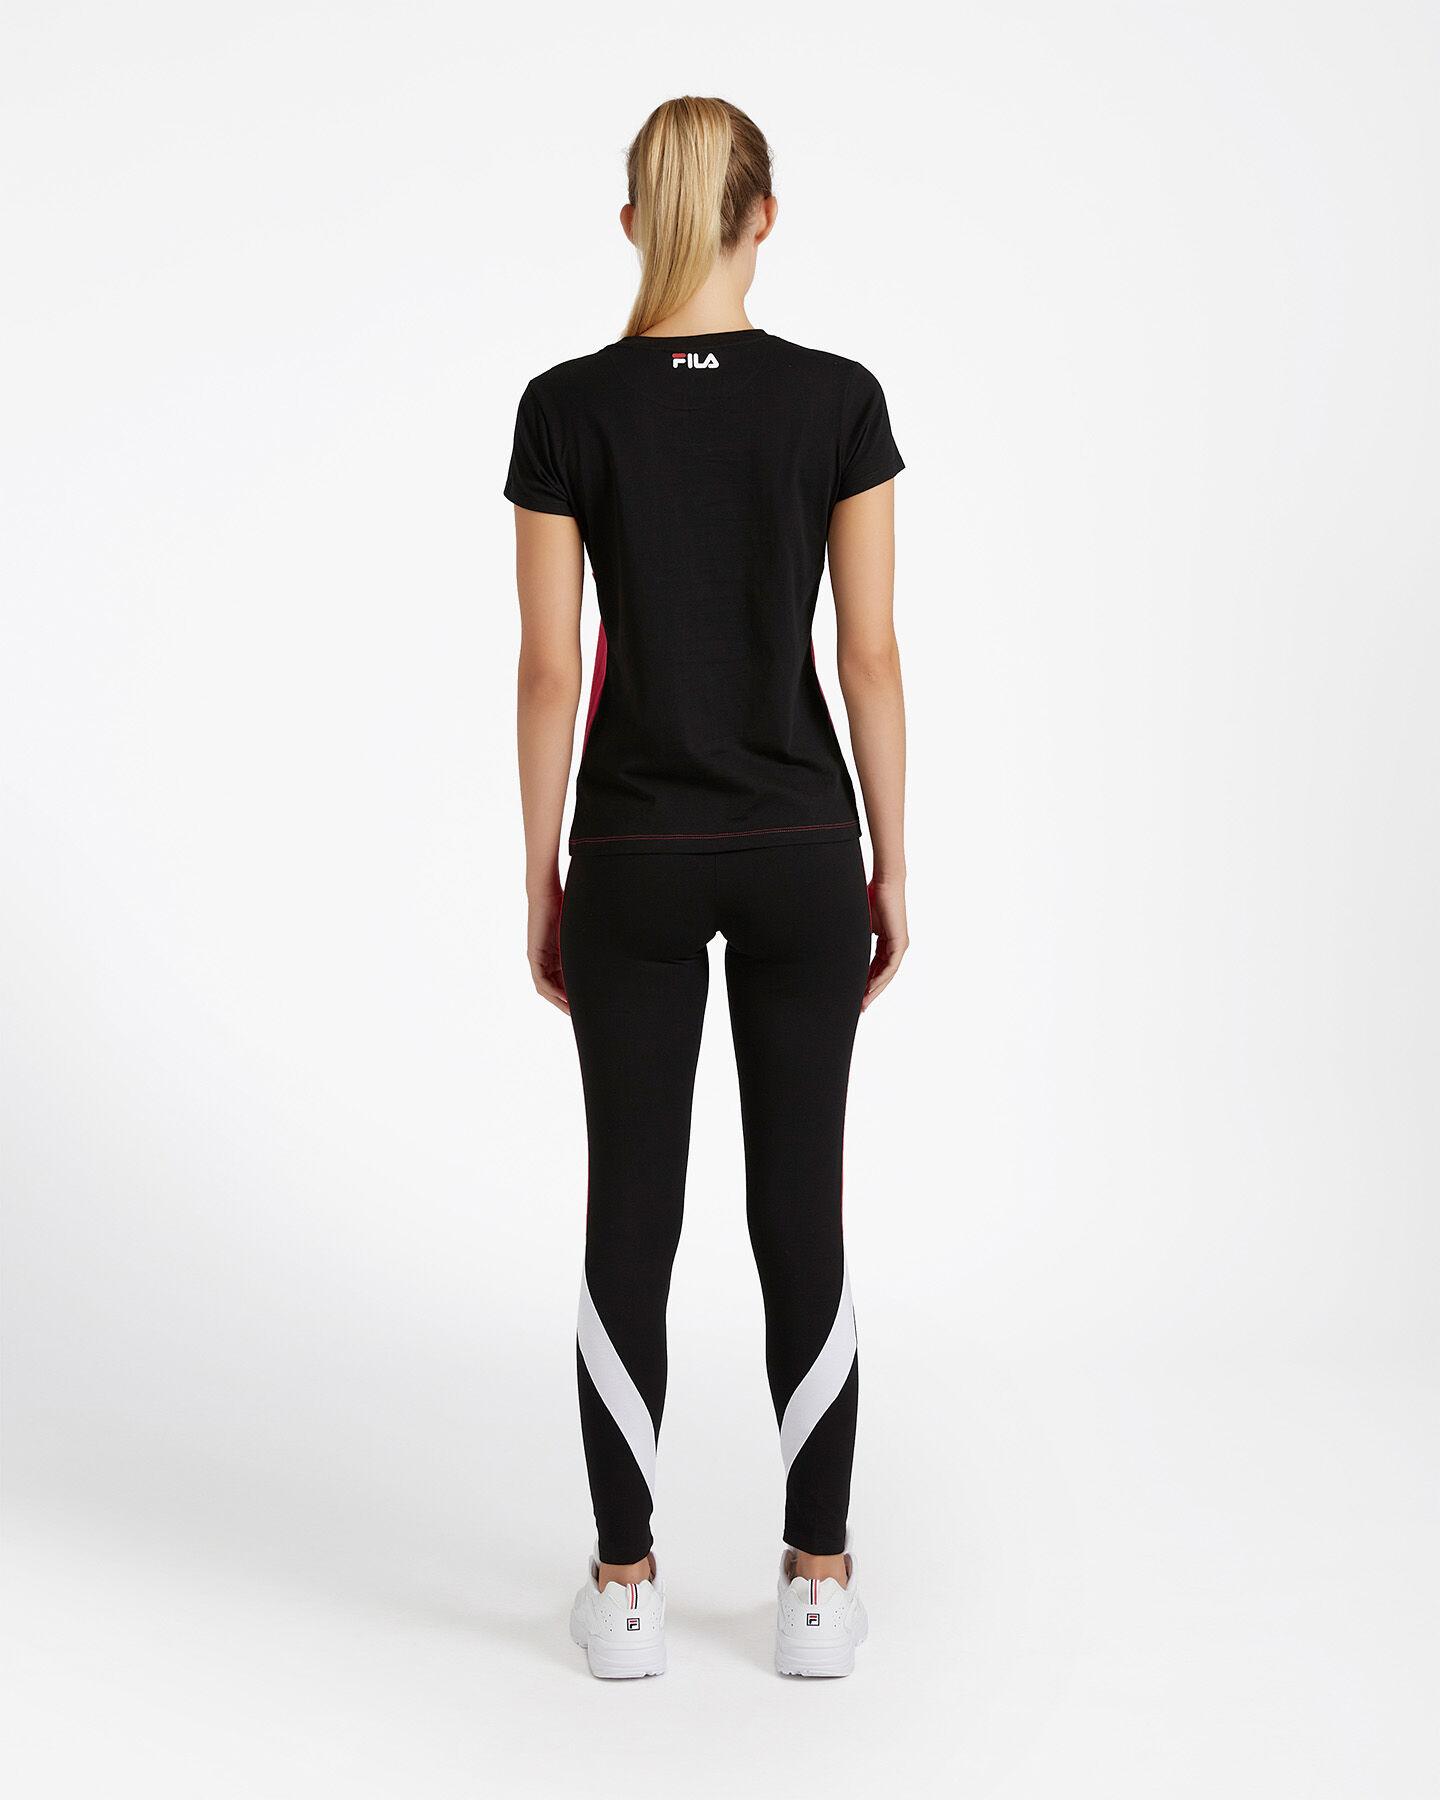 T-Shirt FILA REGULAR COLOR BLOCK W S4080534 scatto 2